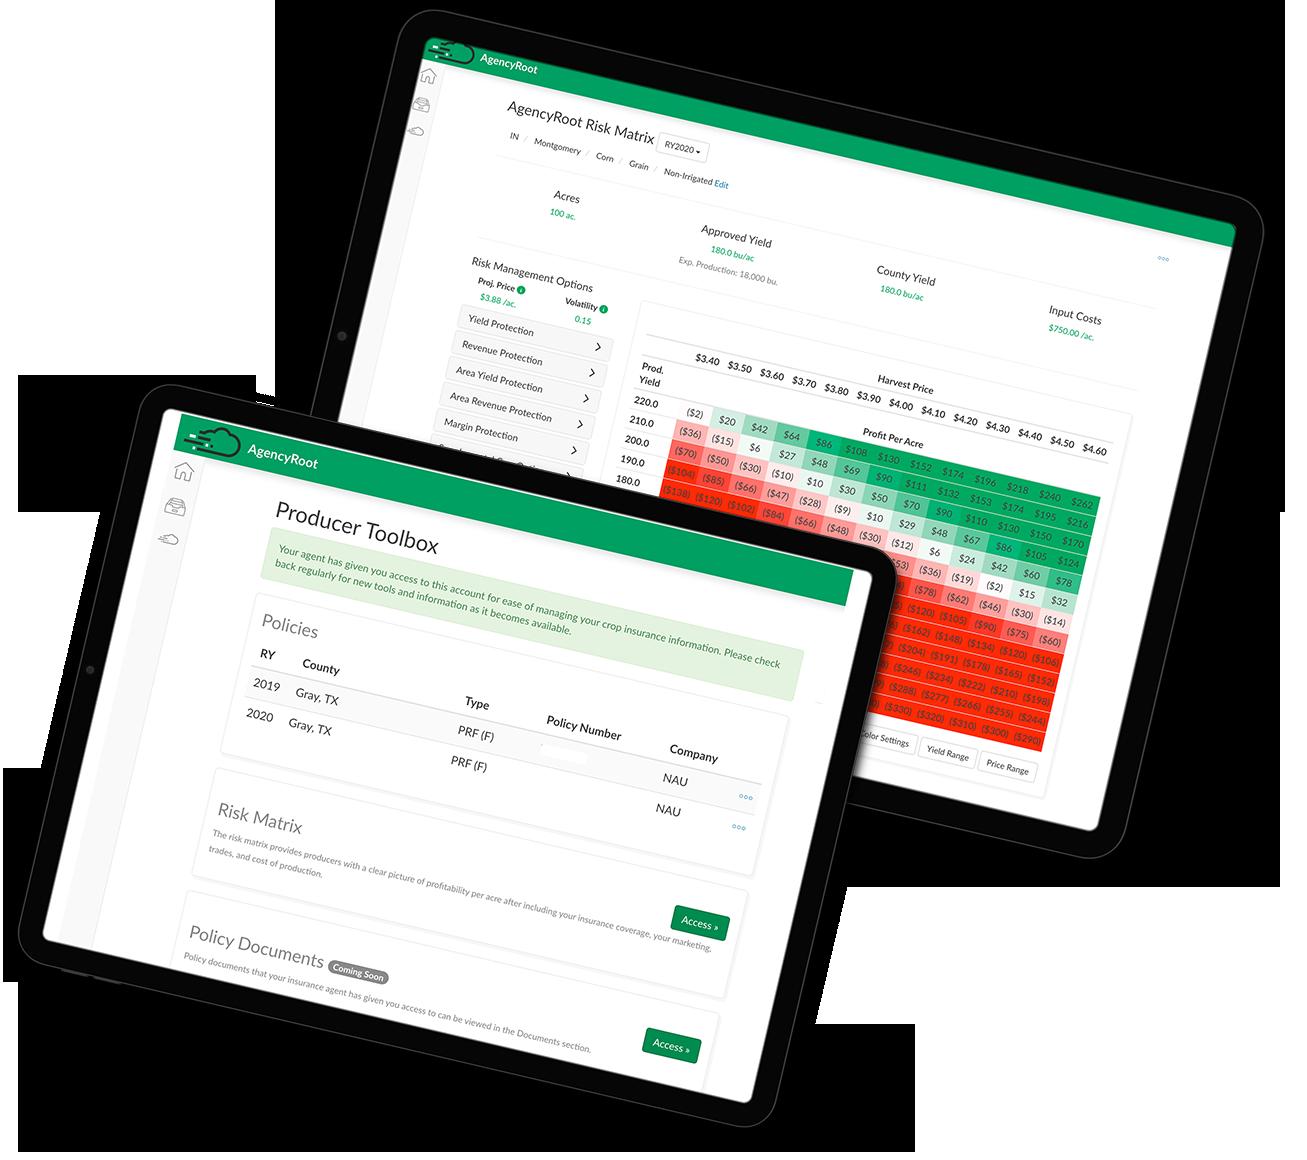 Agency Root | Crop Insurance Made Easy | Fowler Agency, LLC